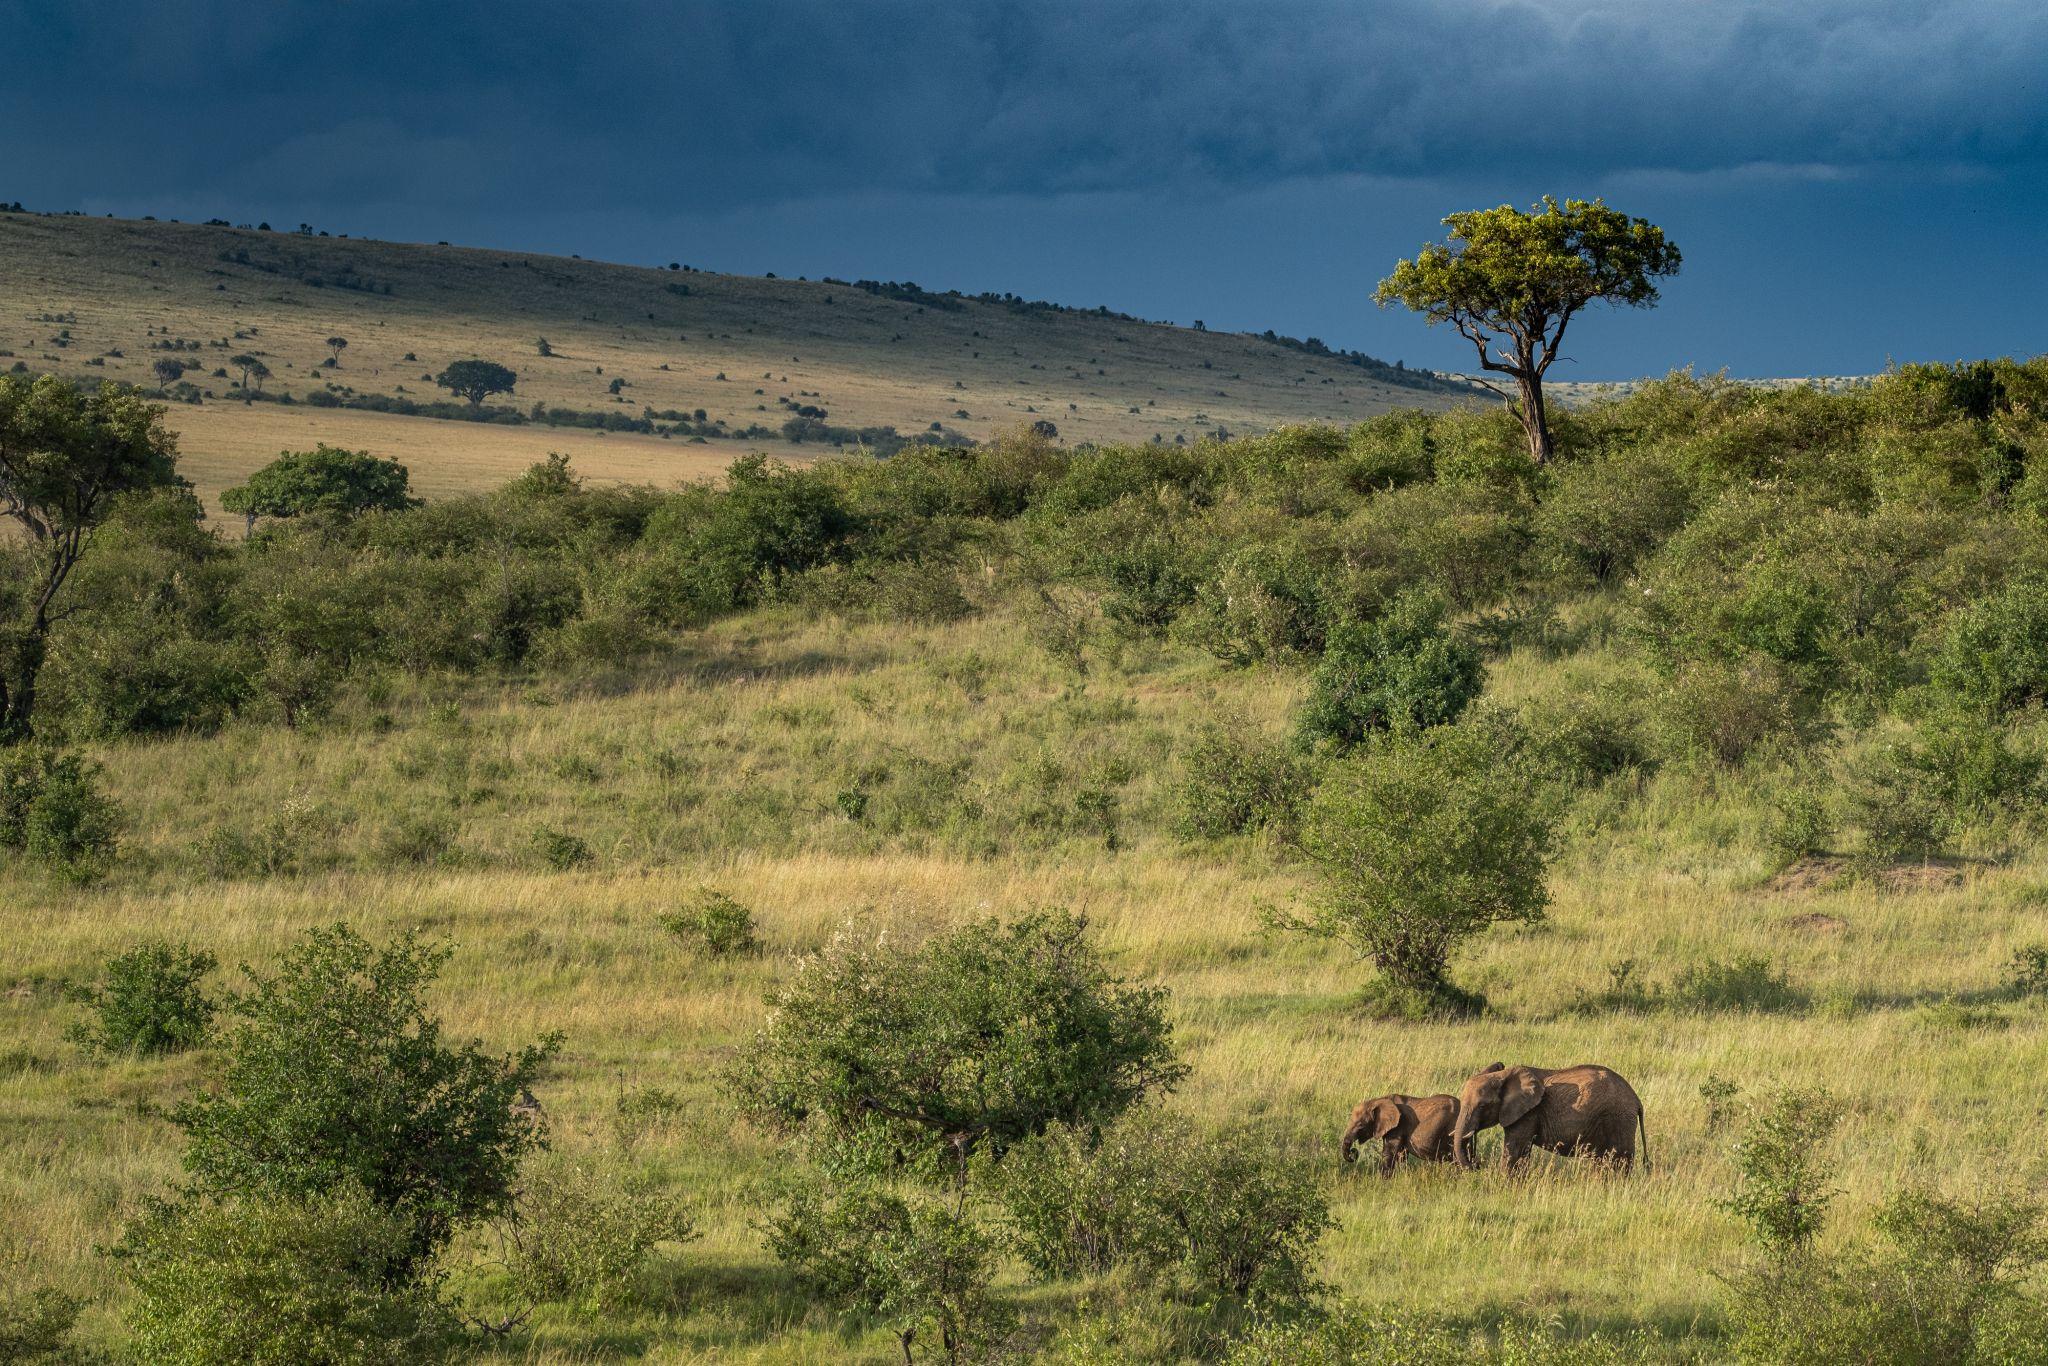 Green valleys after the rain, Maasai Mara National Reserve, Kenya